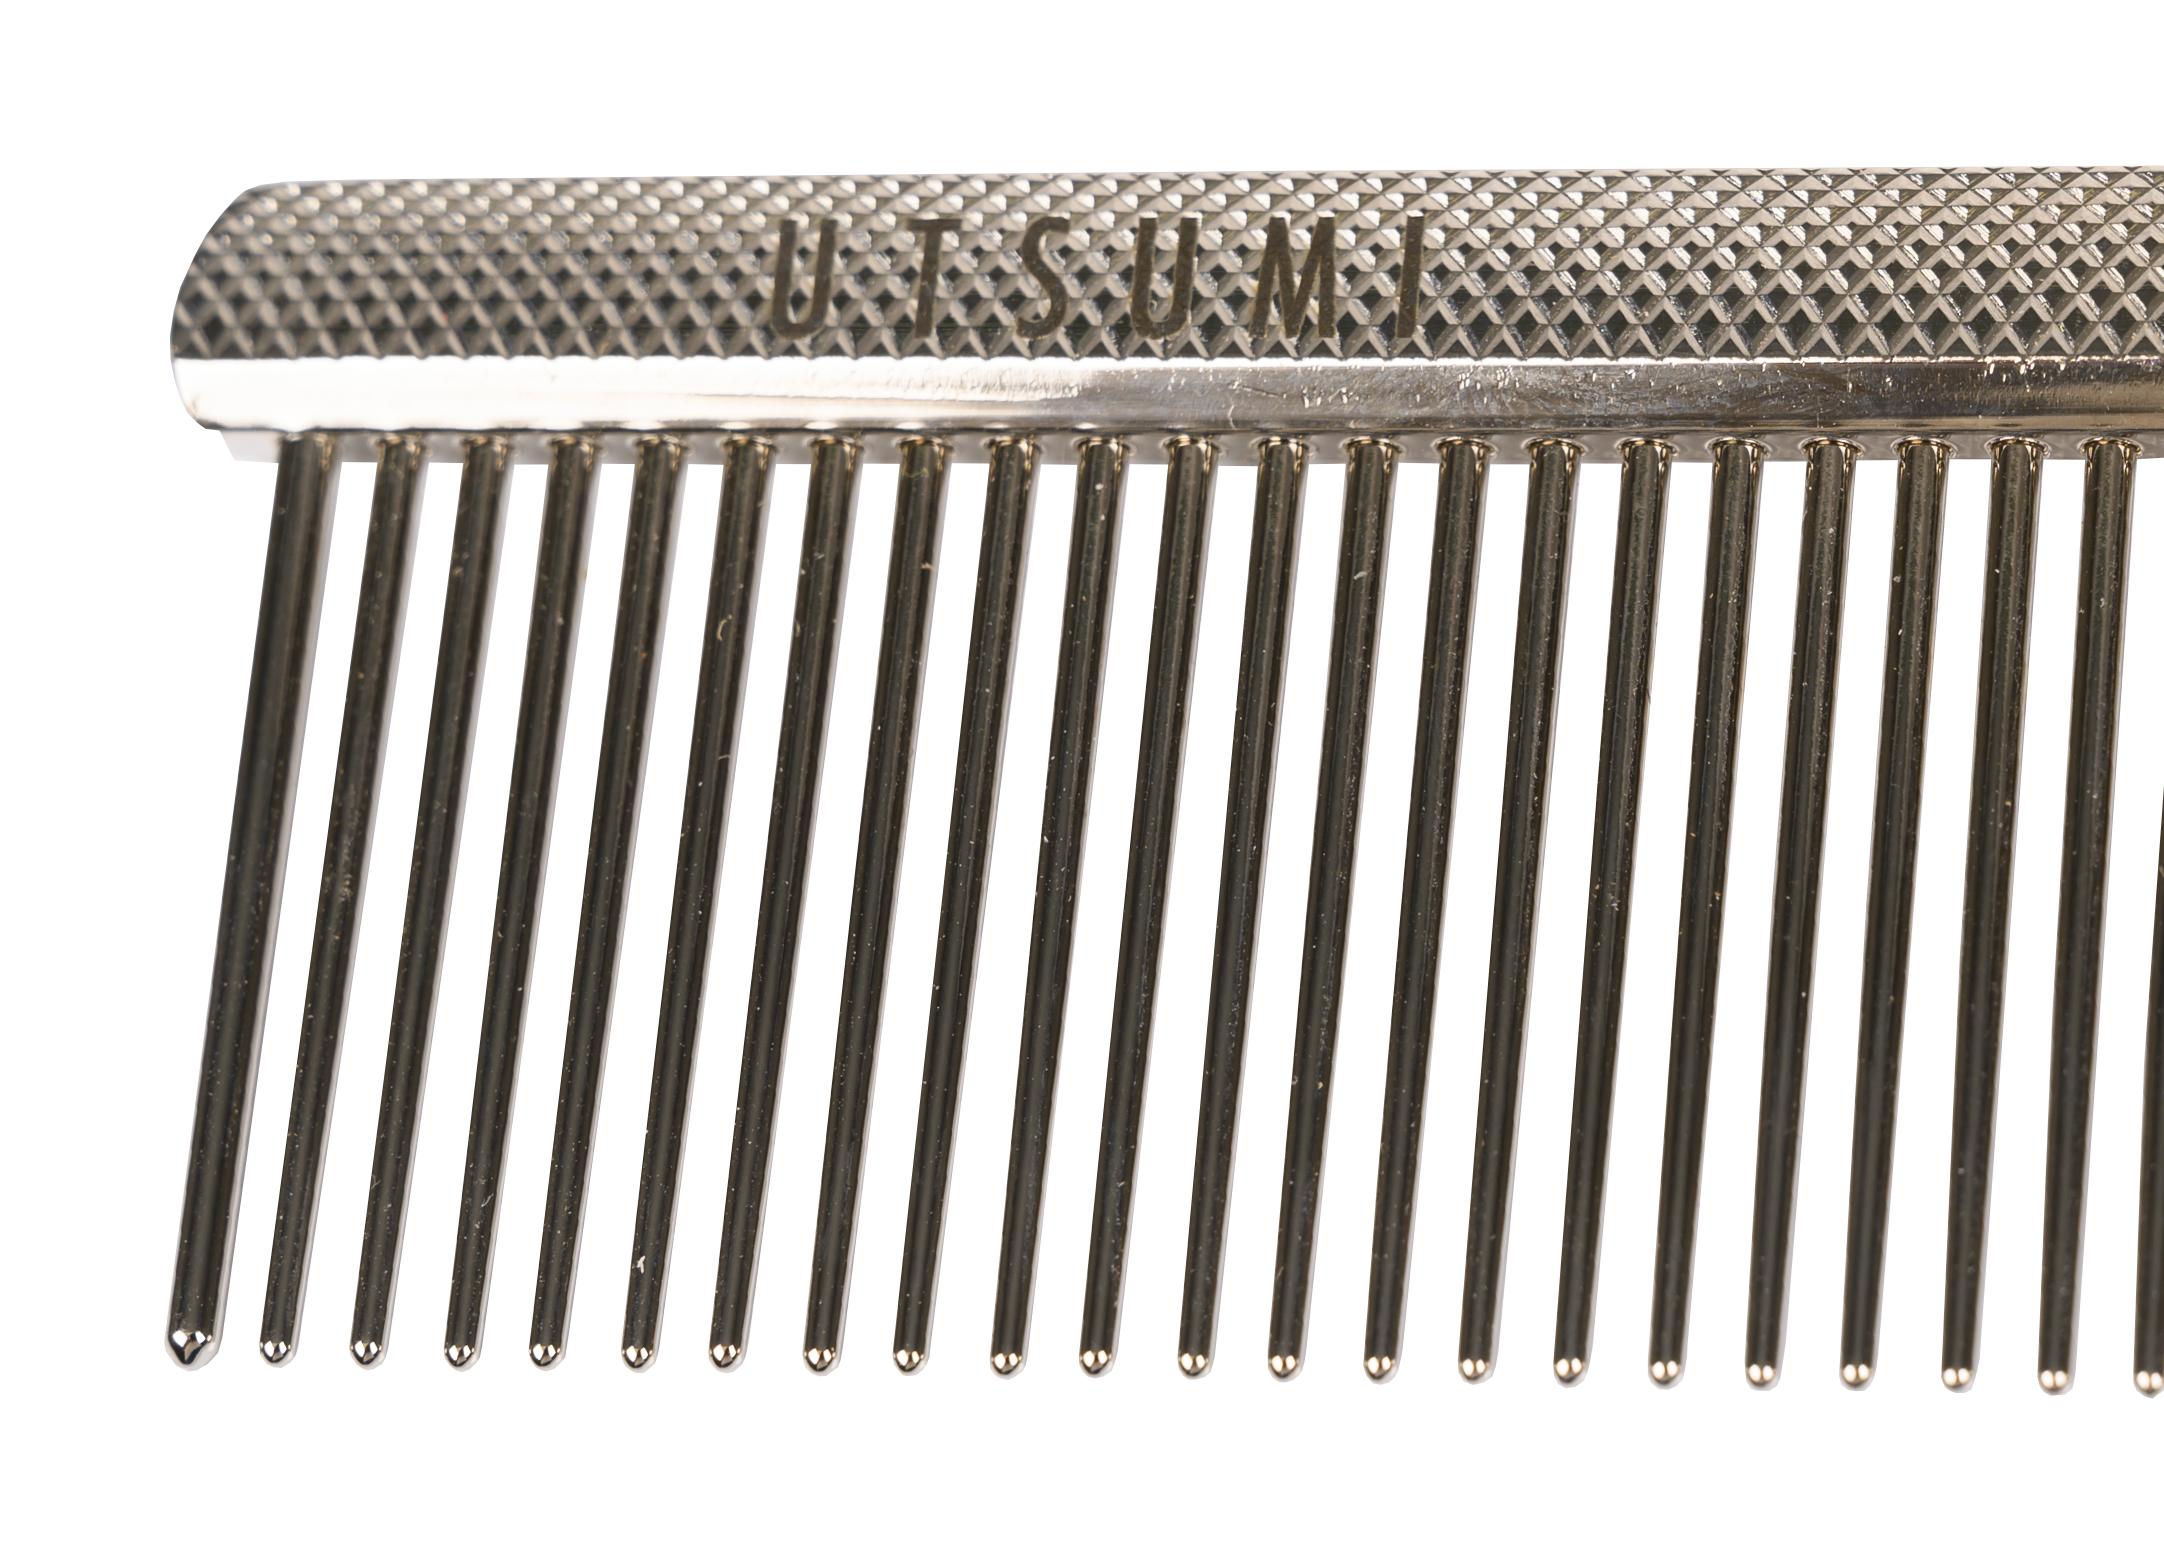 Utsumi Metal Comb Small 15cm